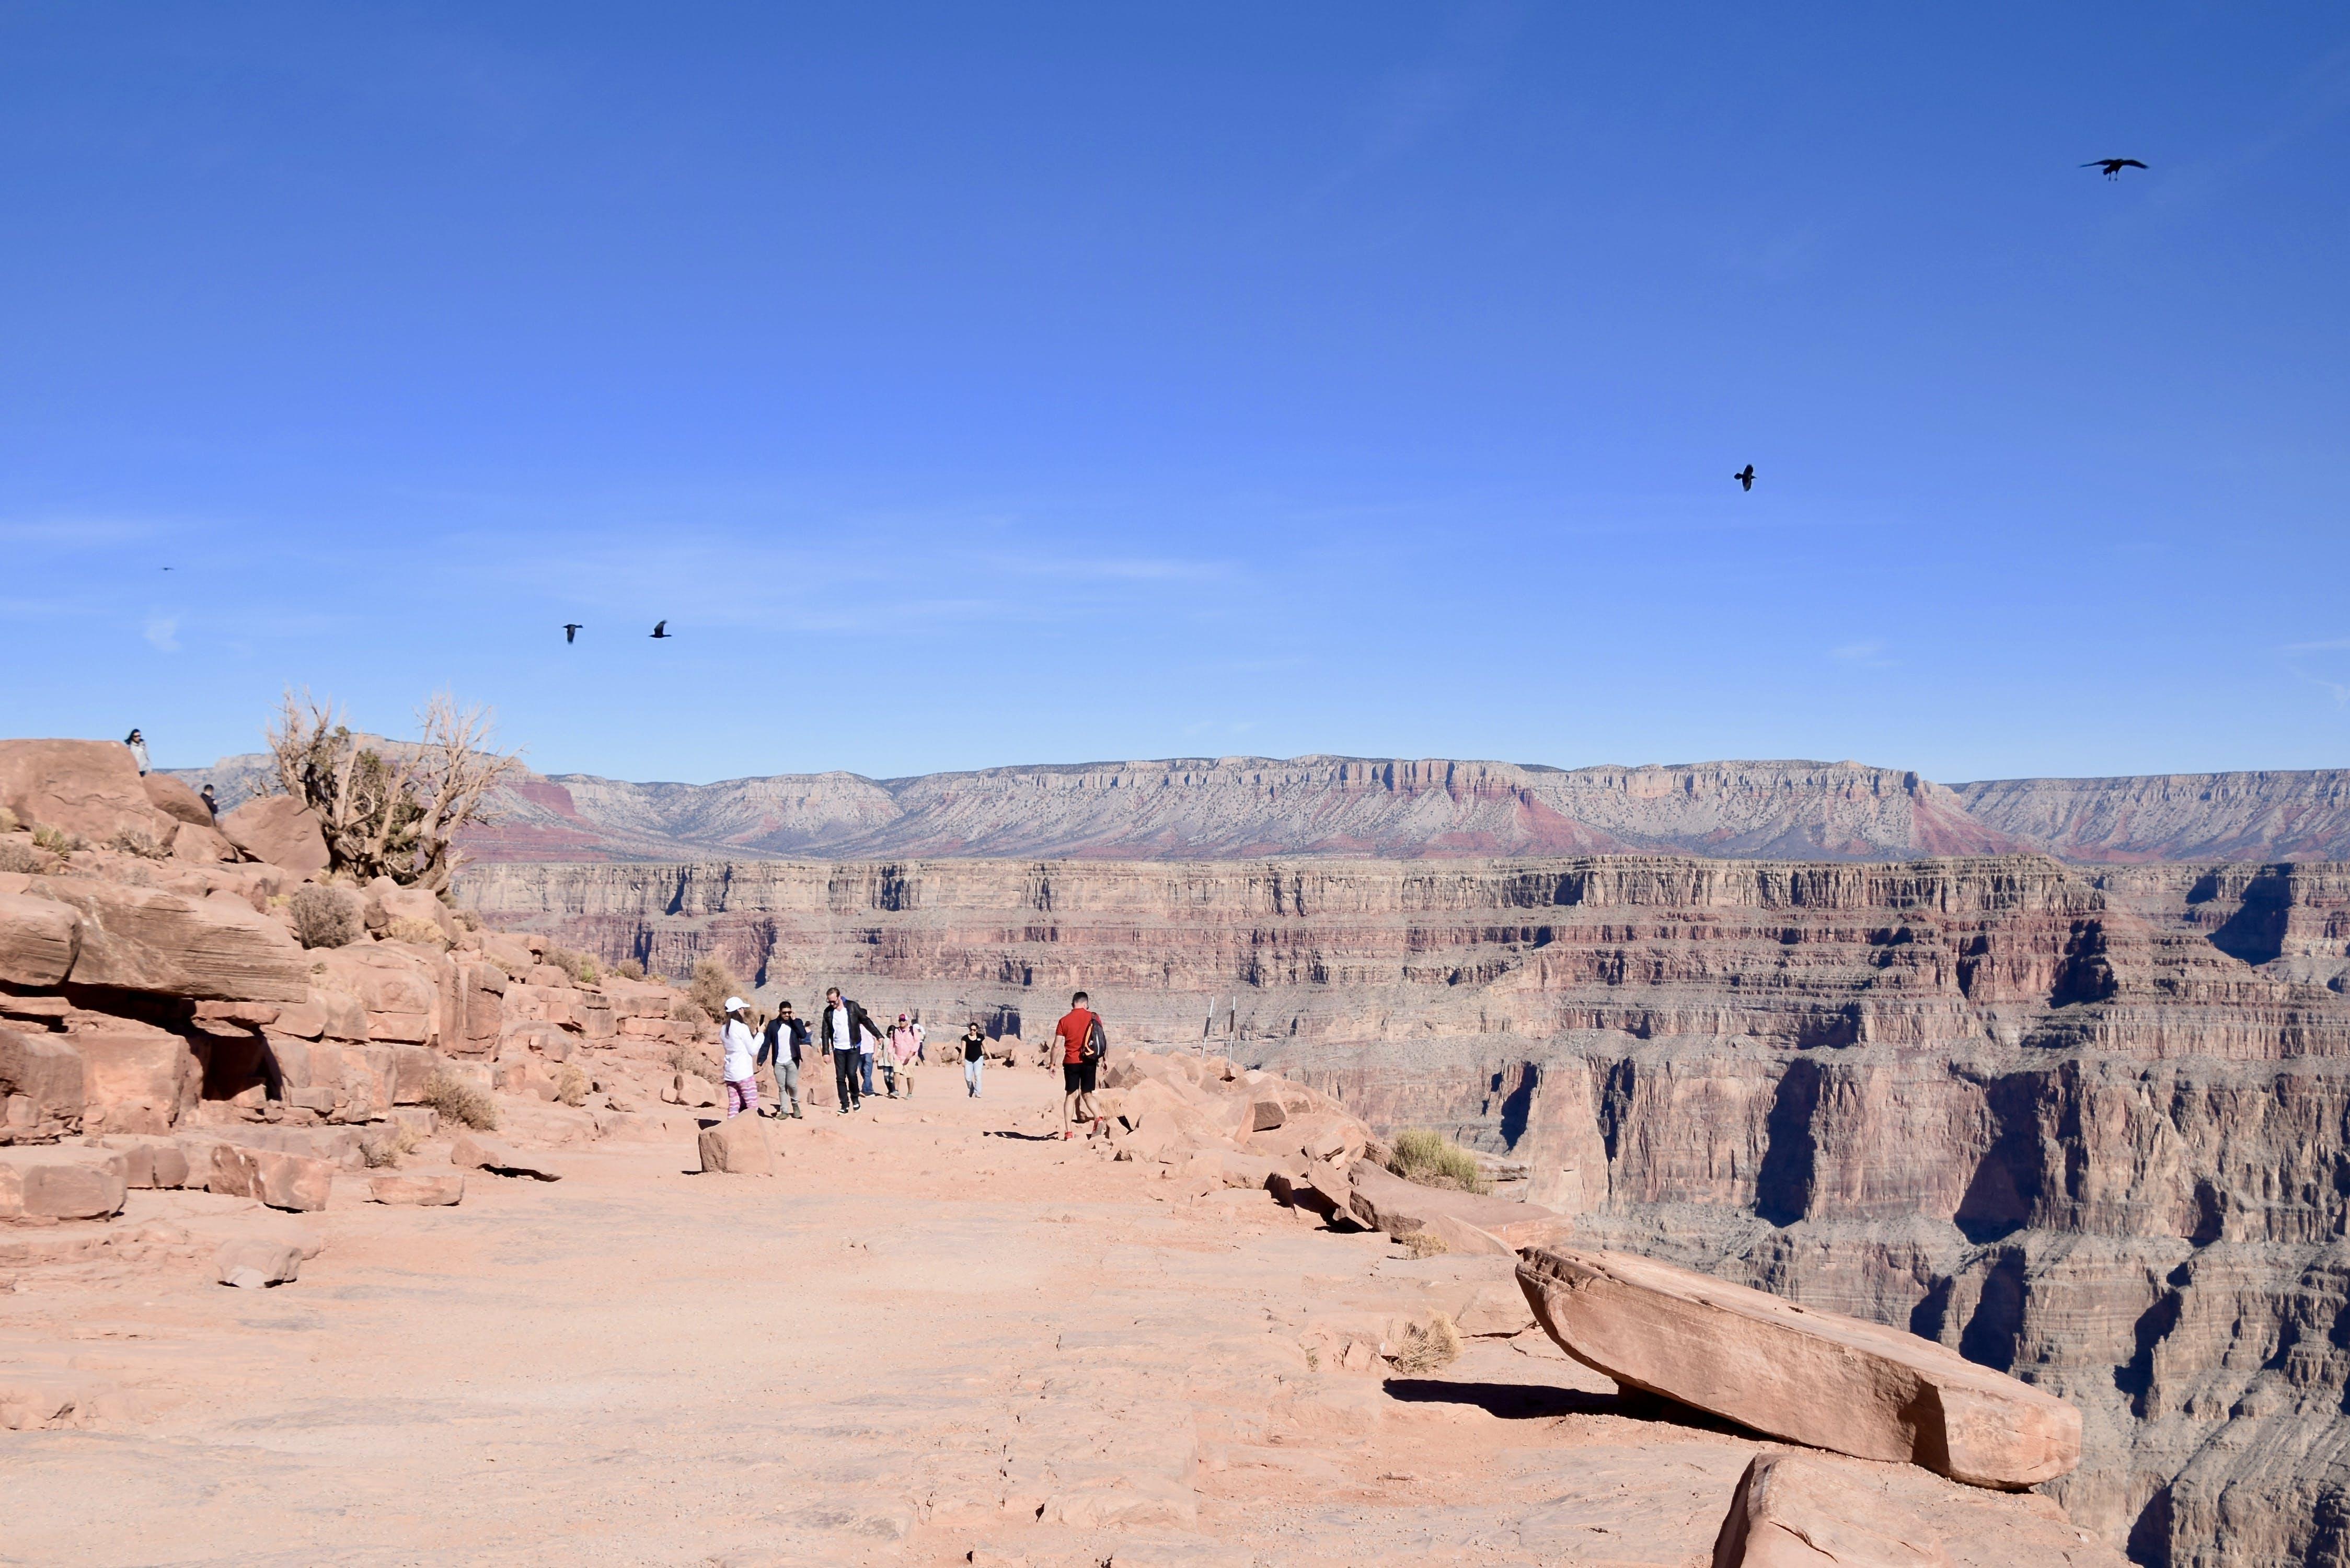 Fotos de stock gratuitas de Arizona, aves voladoras, barranco, cielo